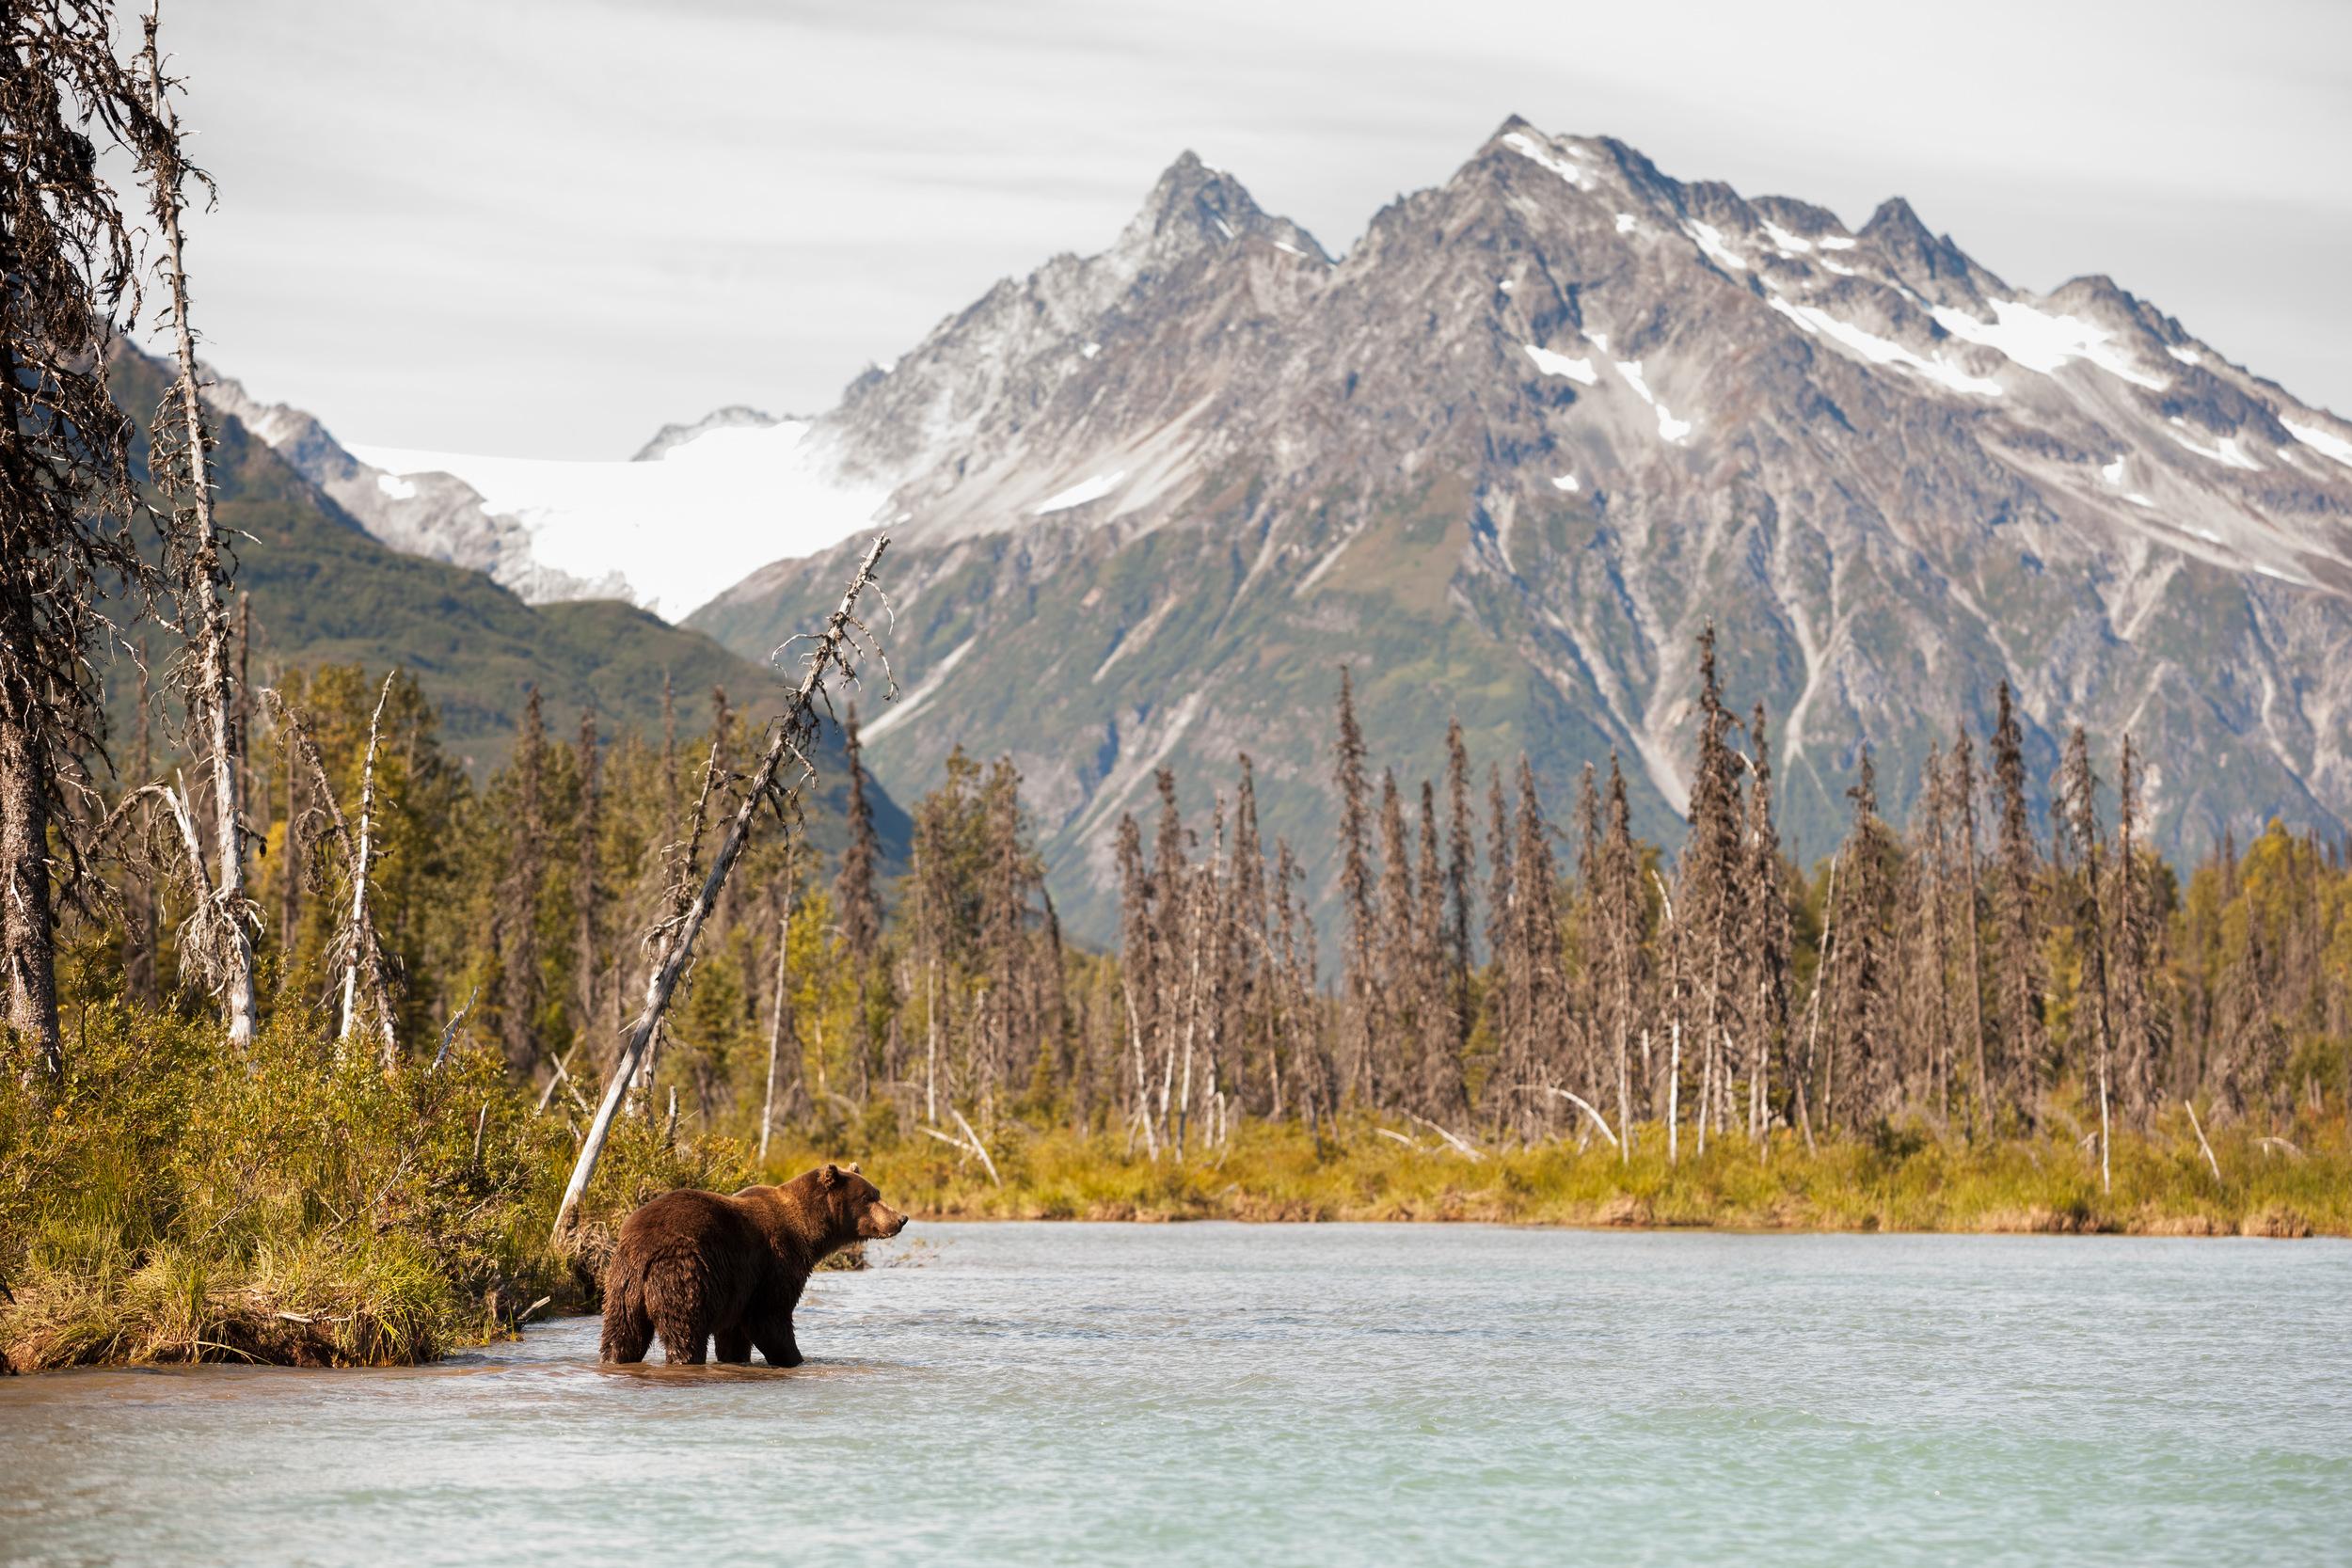 A Coastal Brown Bear Hunting For Fish –(PHOTO: JIMDAVID/SHUTTERSTOCK)